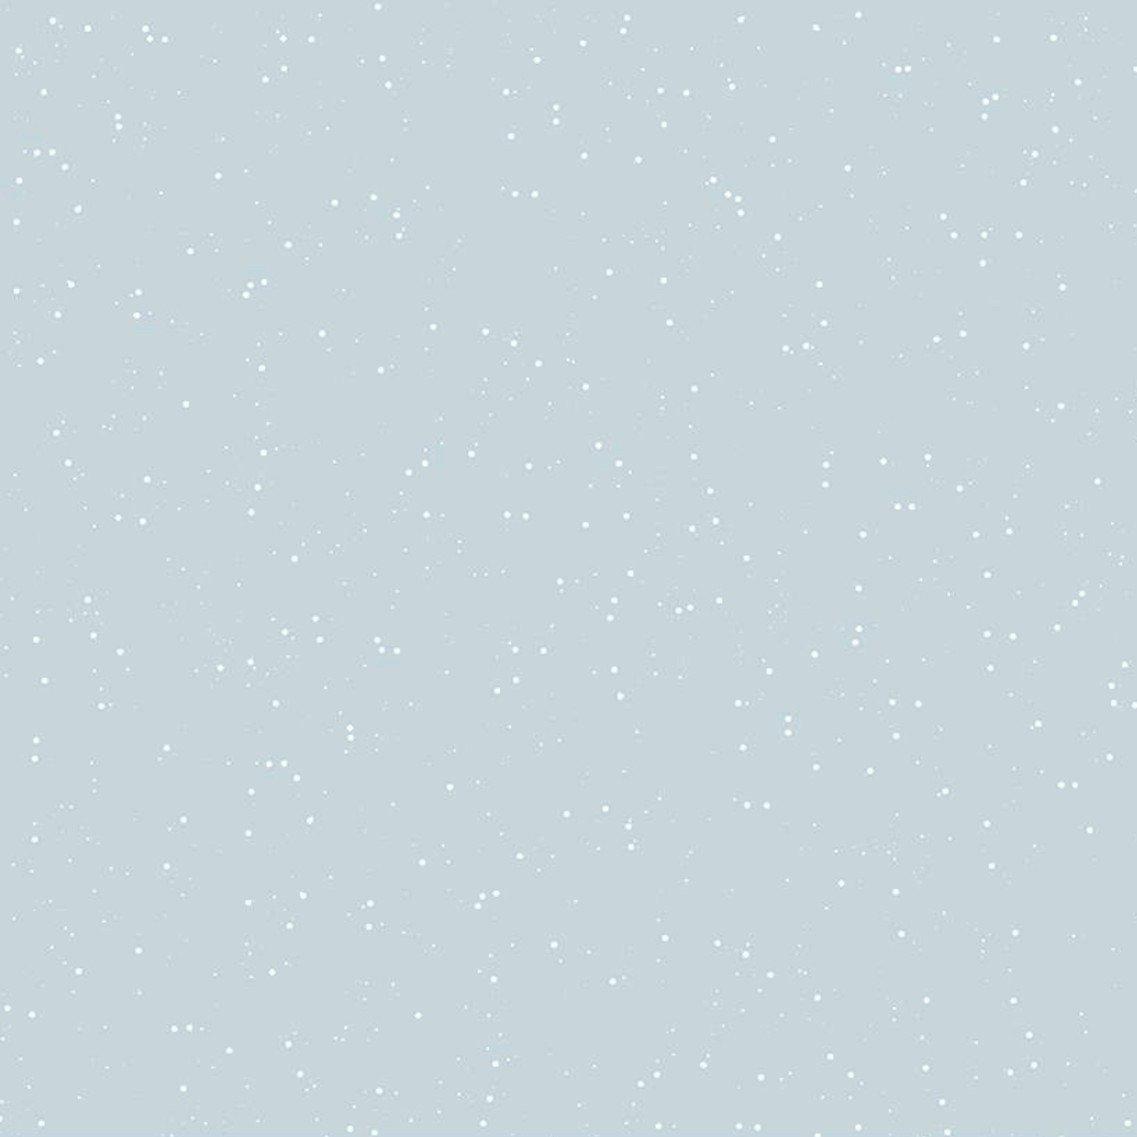 Amanda Castor Winterland - Flurries (Sky)